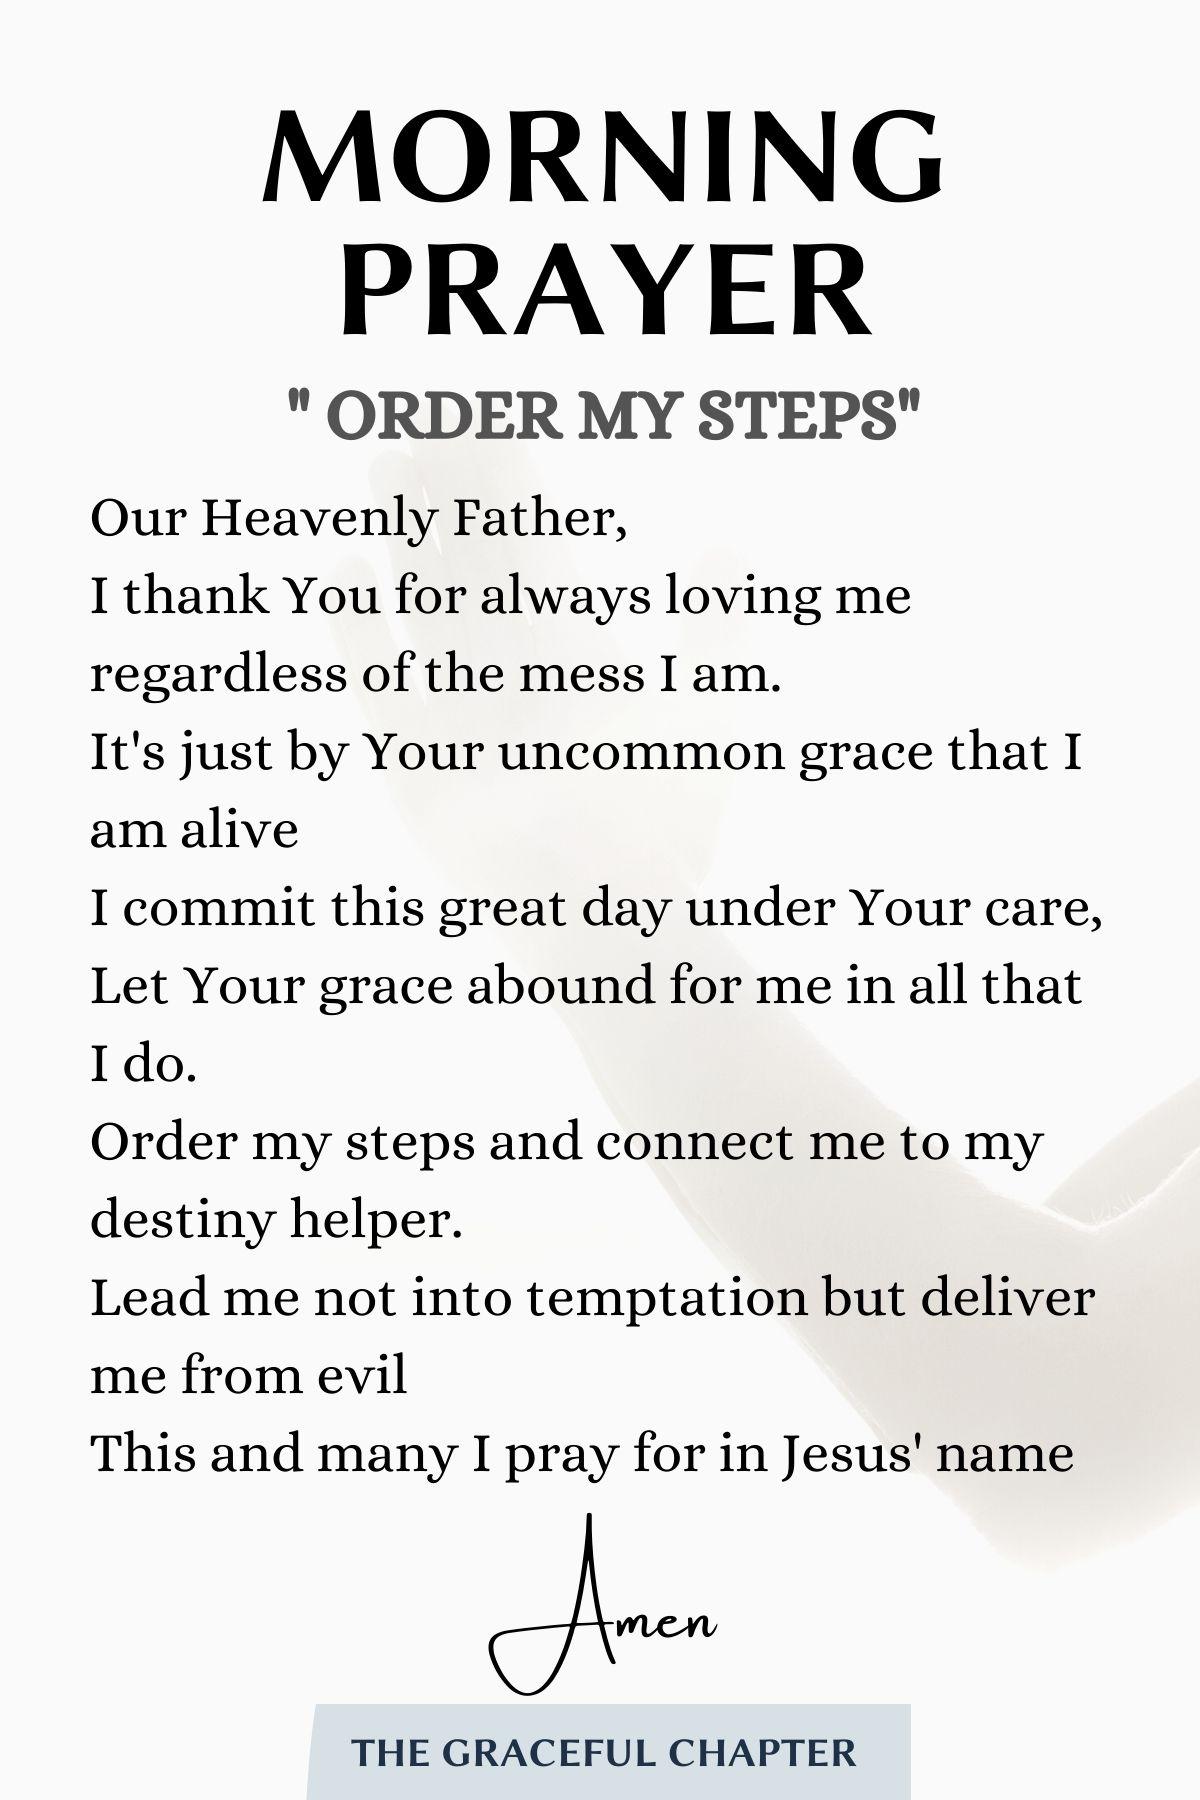 morning prayer - order my steps